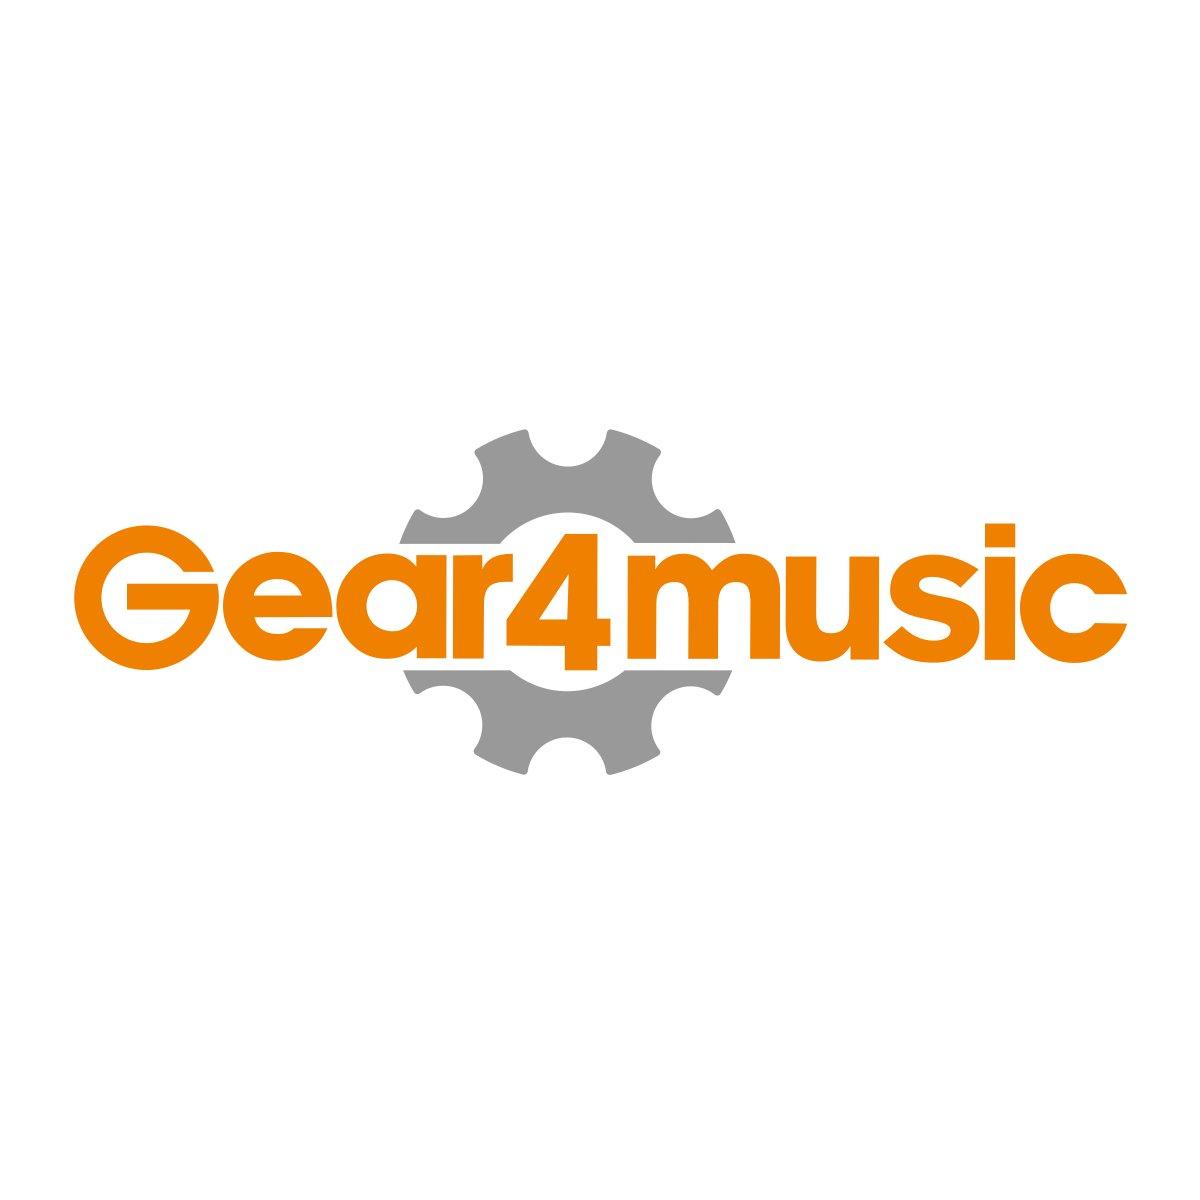 Electric Guitar Foam Case by Gear4music